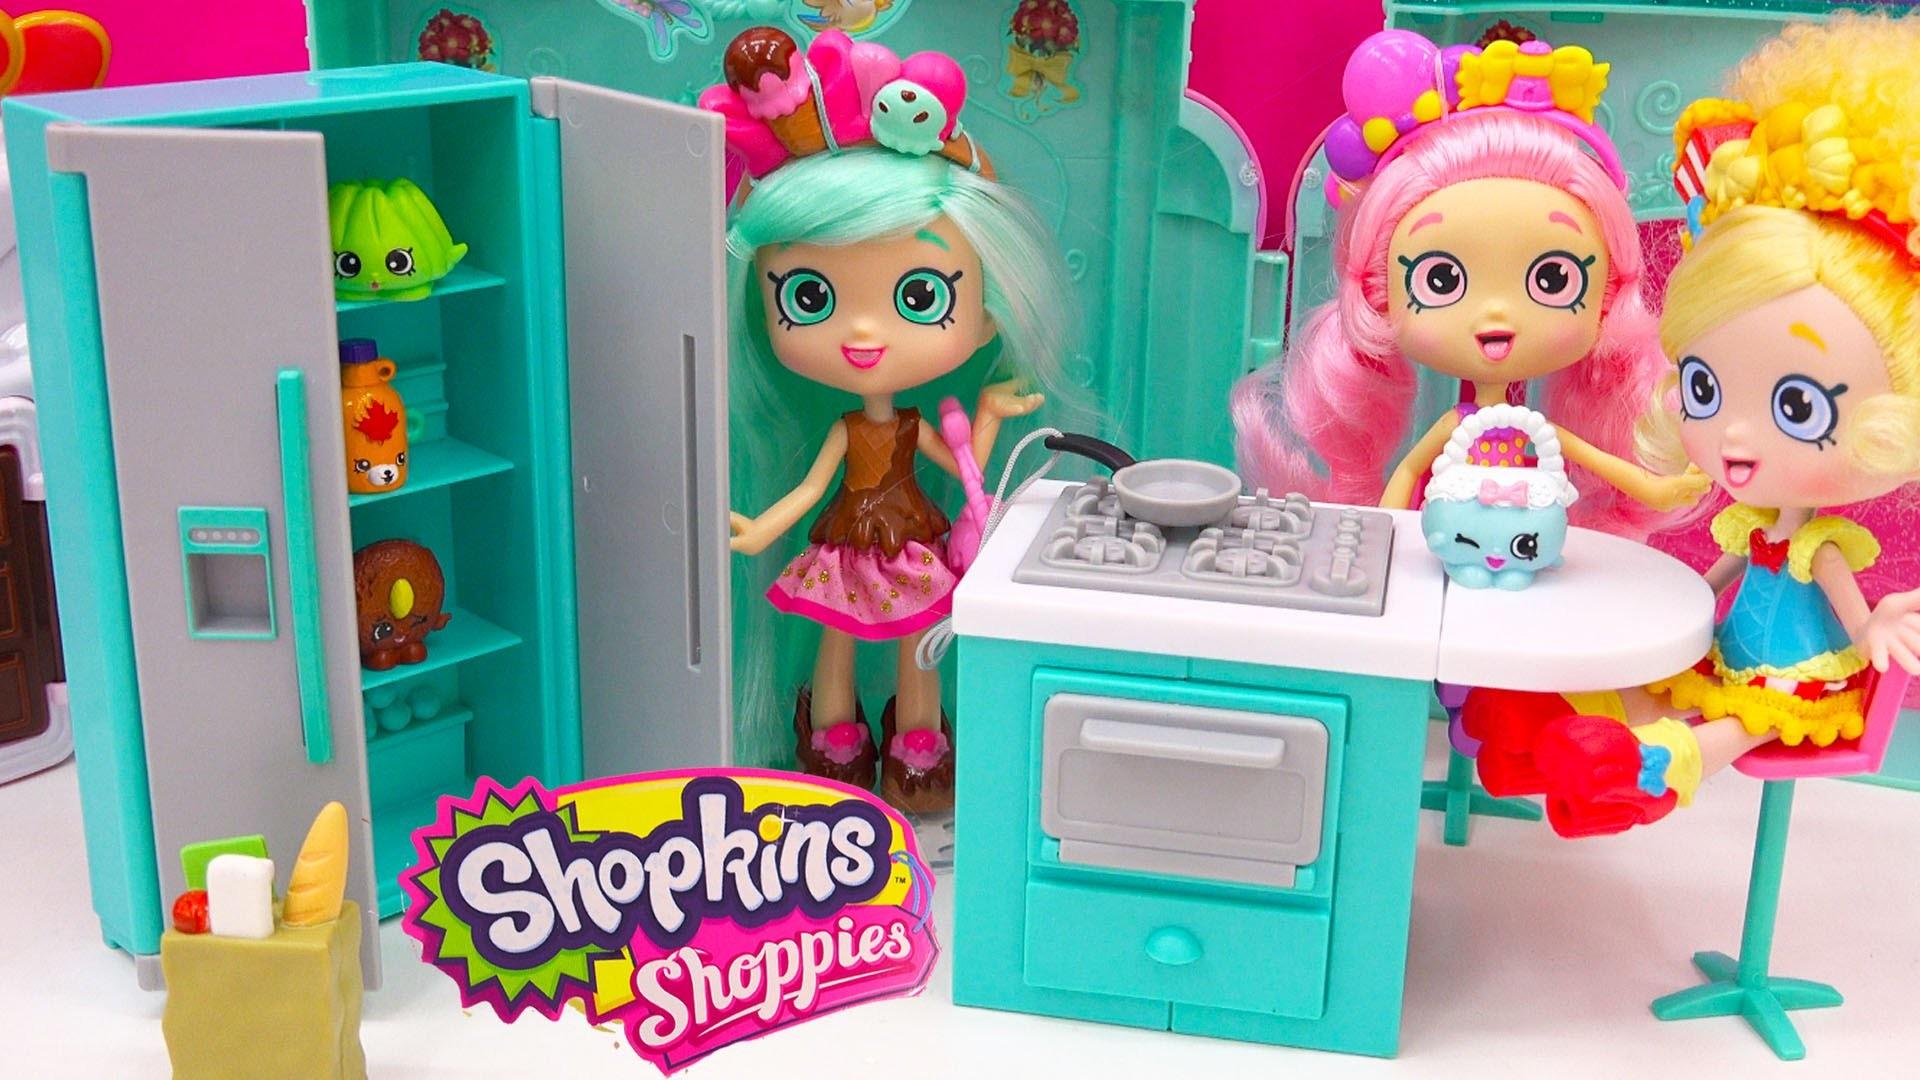 Shoppies Peppa Mint Fridge, Oven, Kitchen with Shopkins Season 4 Blind Bag  Unboxing – Cookieswirlc – YouTube